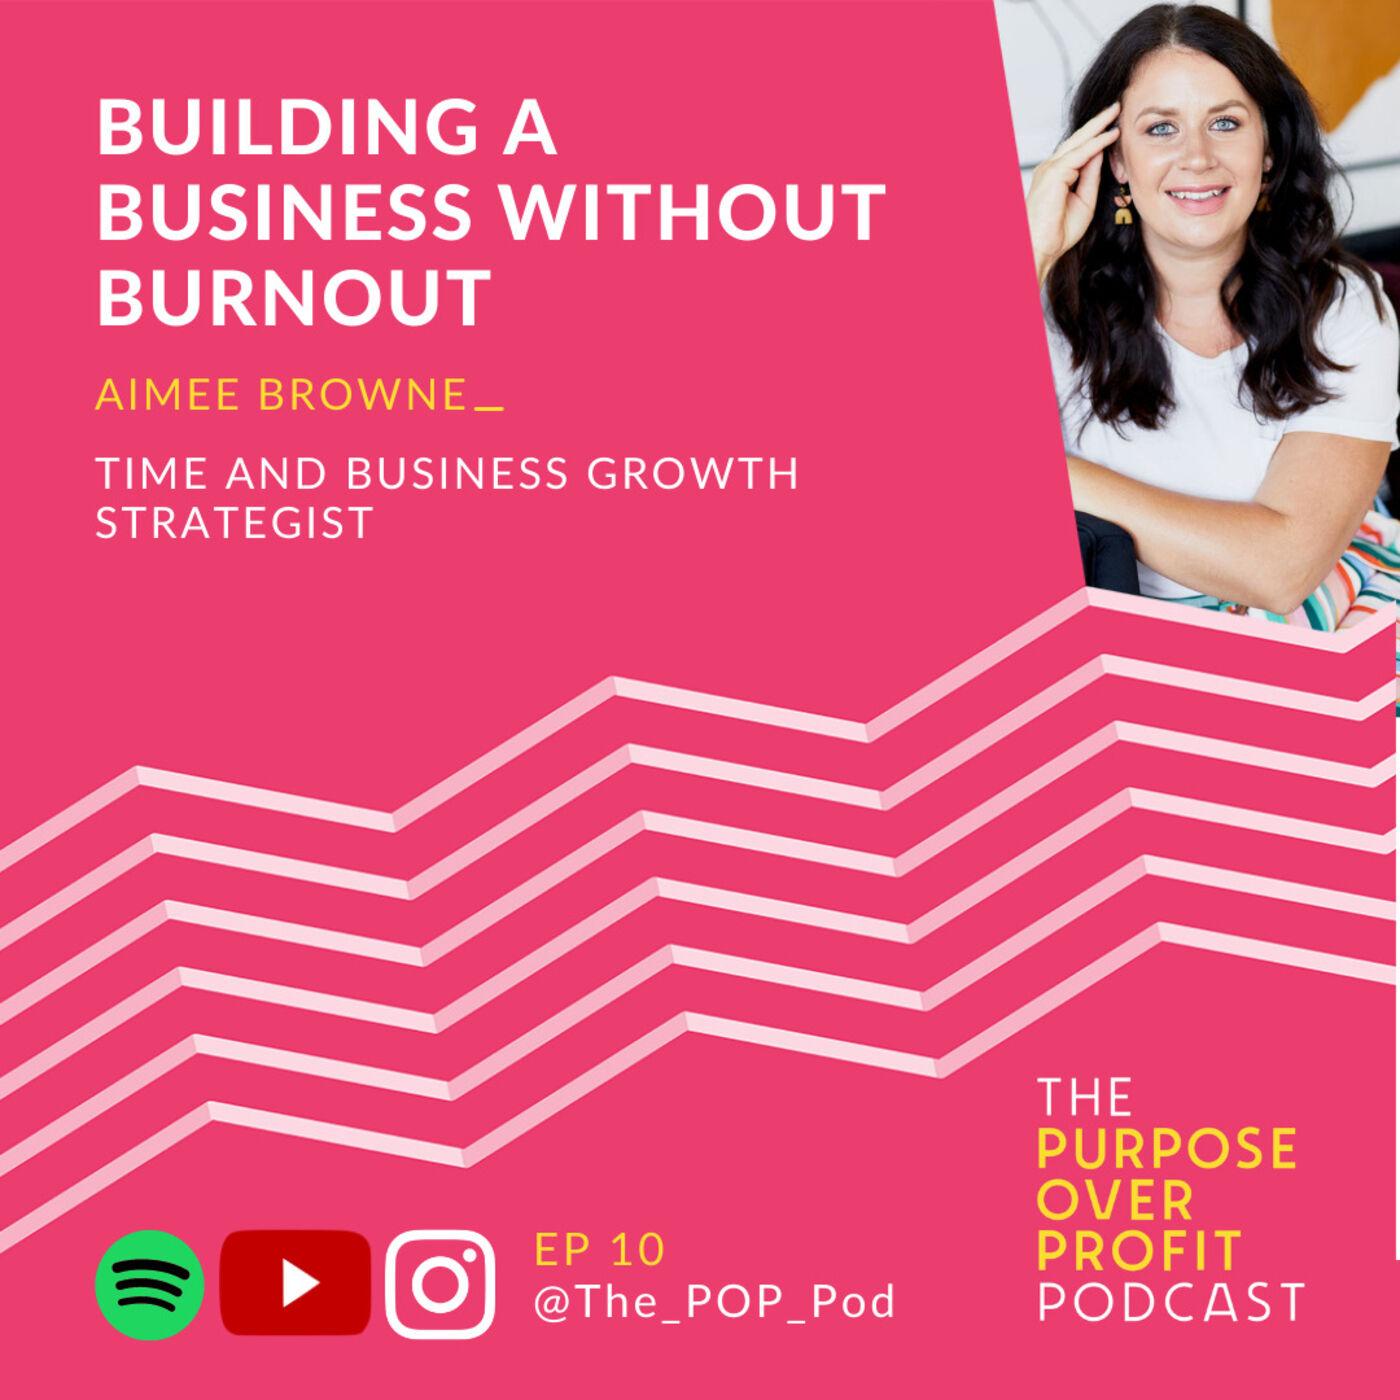 10 - Building a Business Without Burnout